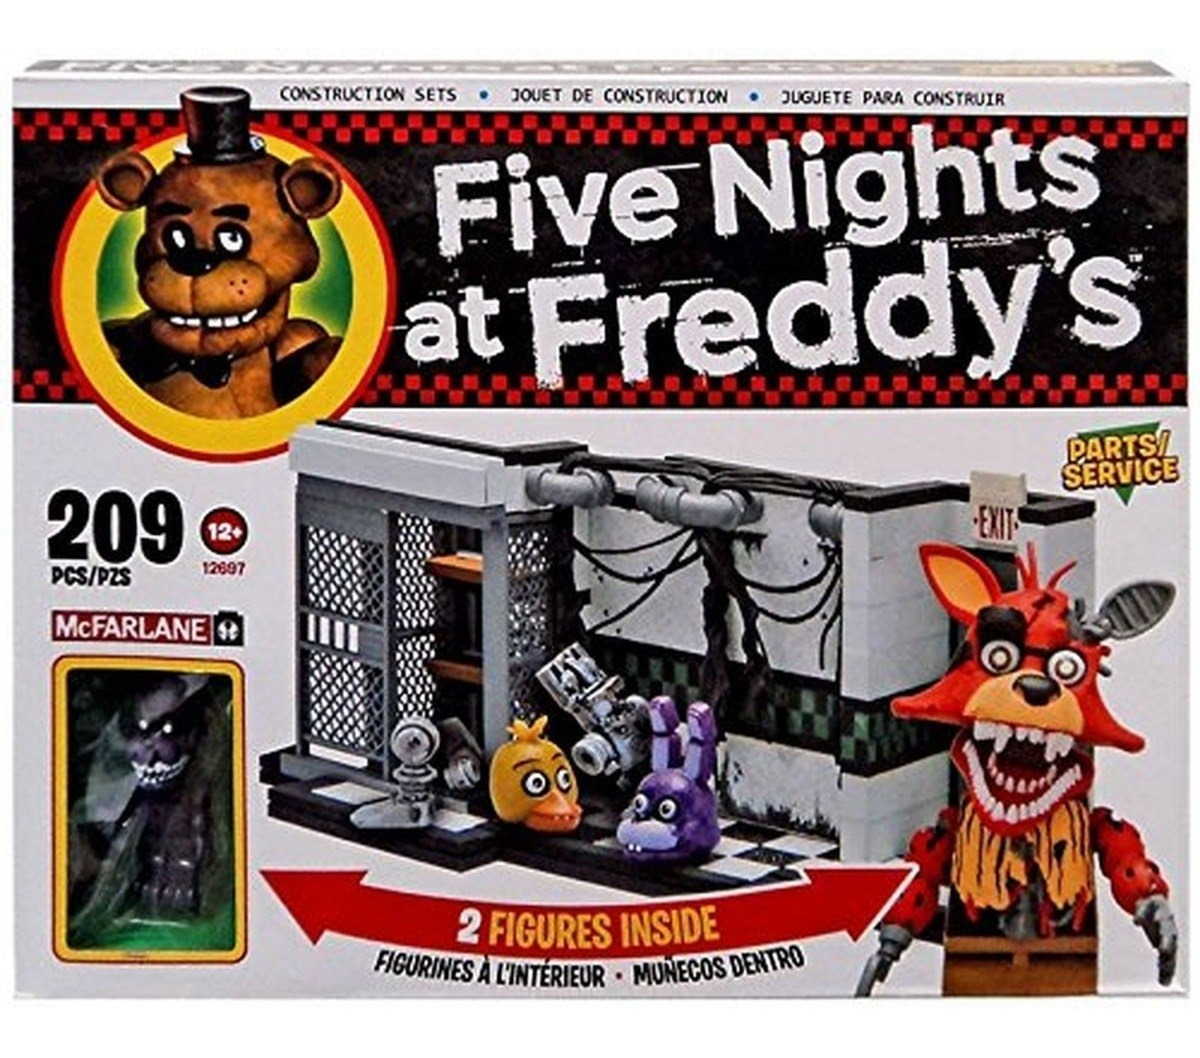 SERVICE 209 pcs NEW McFarlane 12697 Five Nights at Freddy/'s PARTS